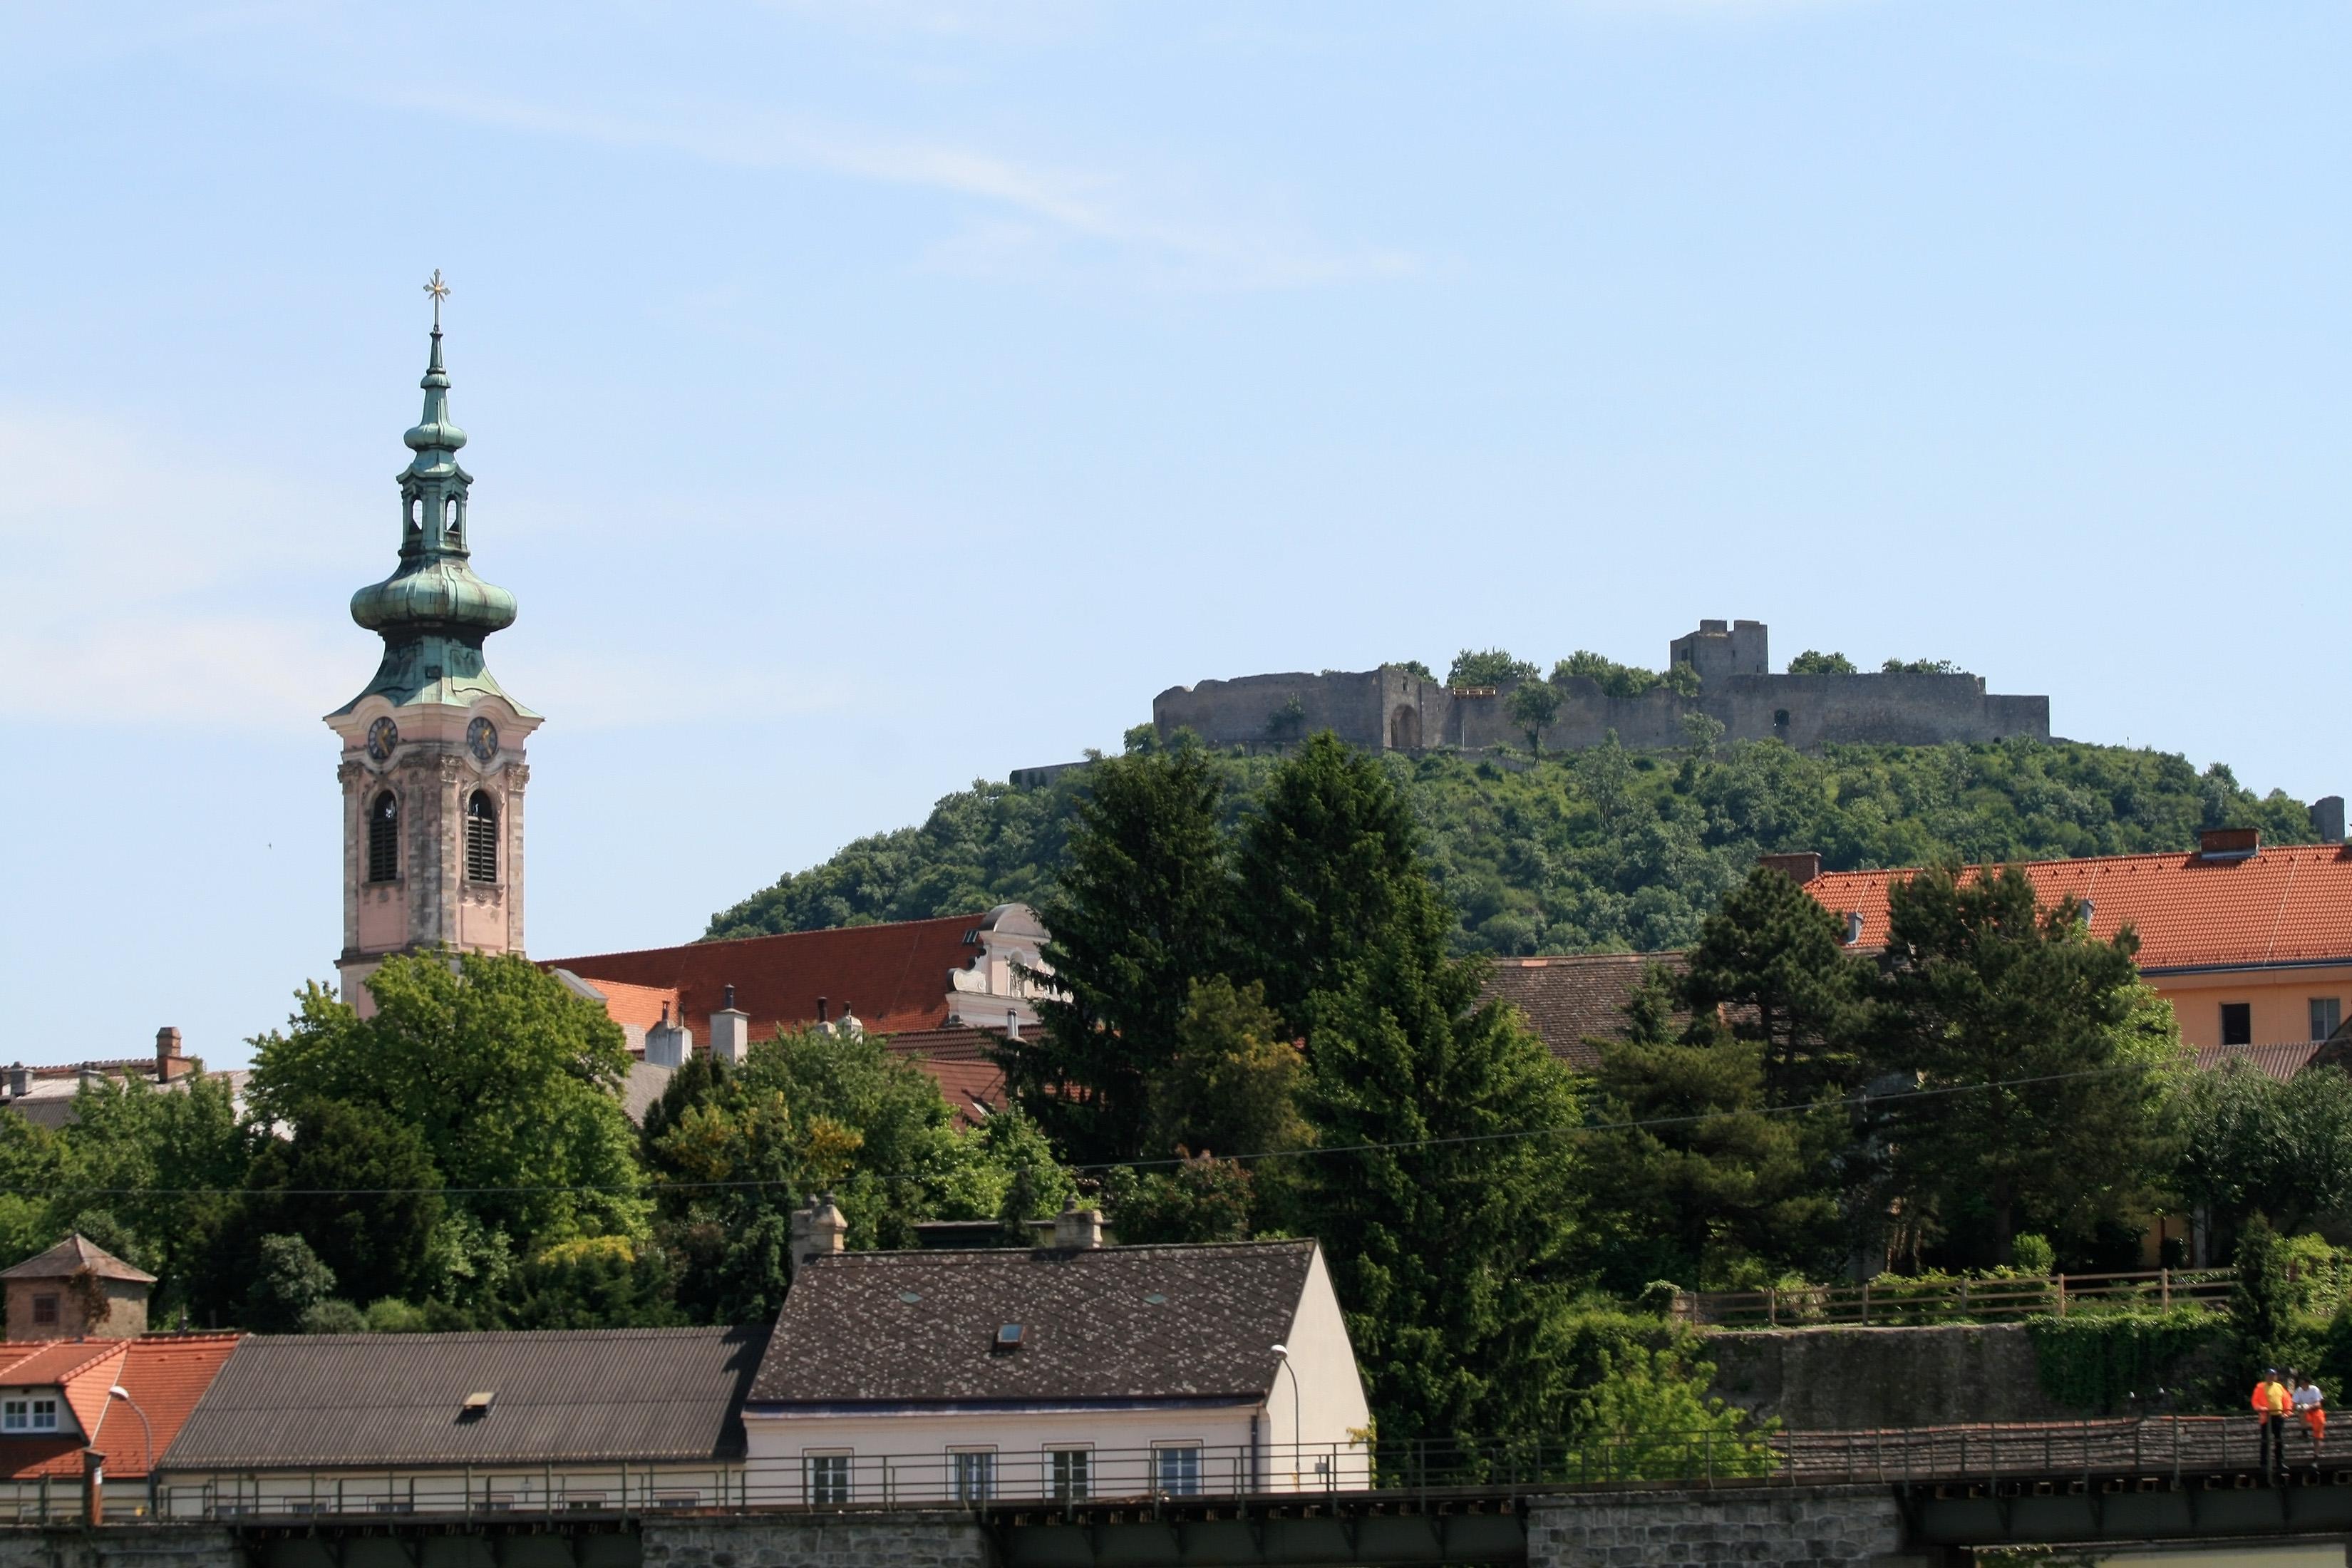 Hainburg Austria  City pictures : Hainburg an der Donau 2011 d Wikimedia Commons